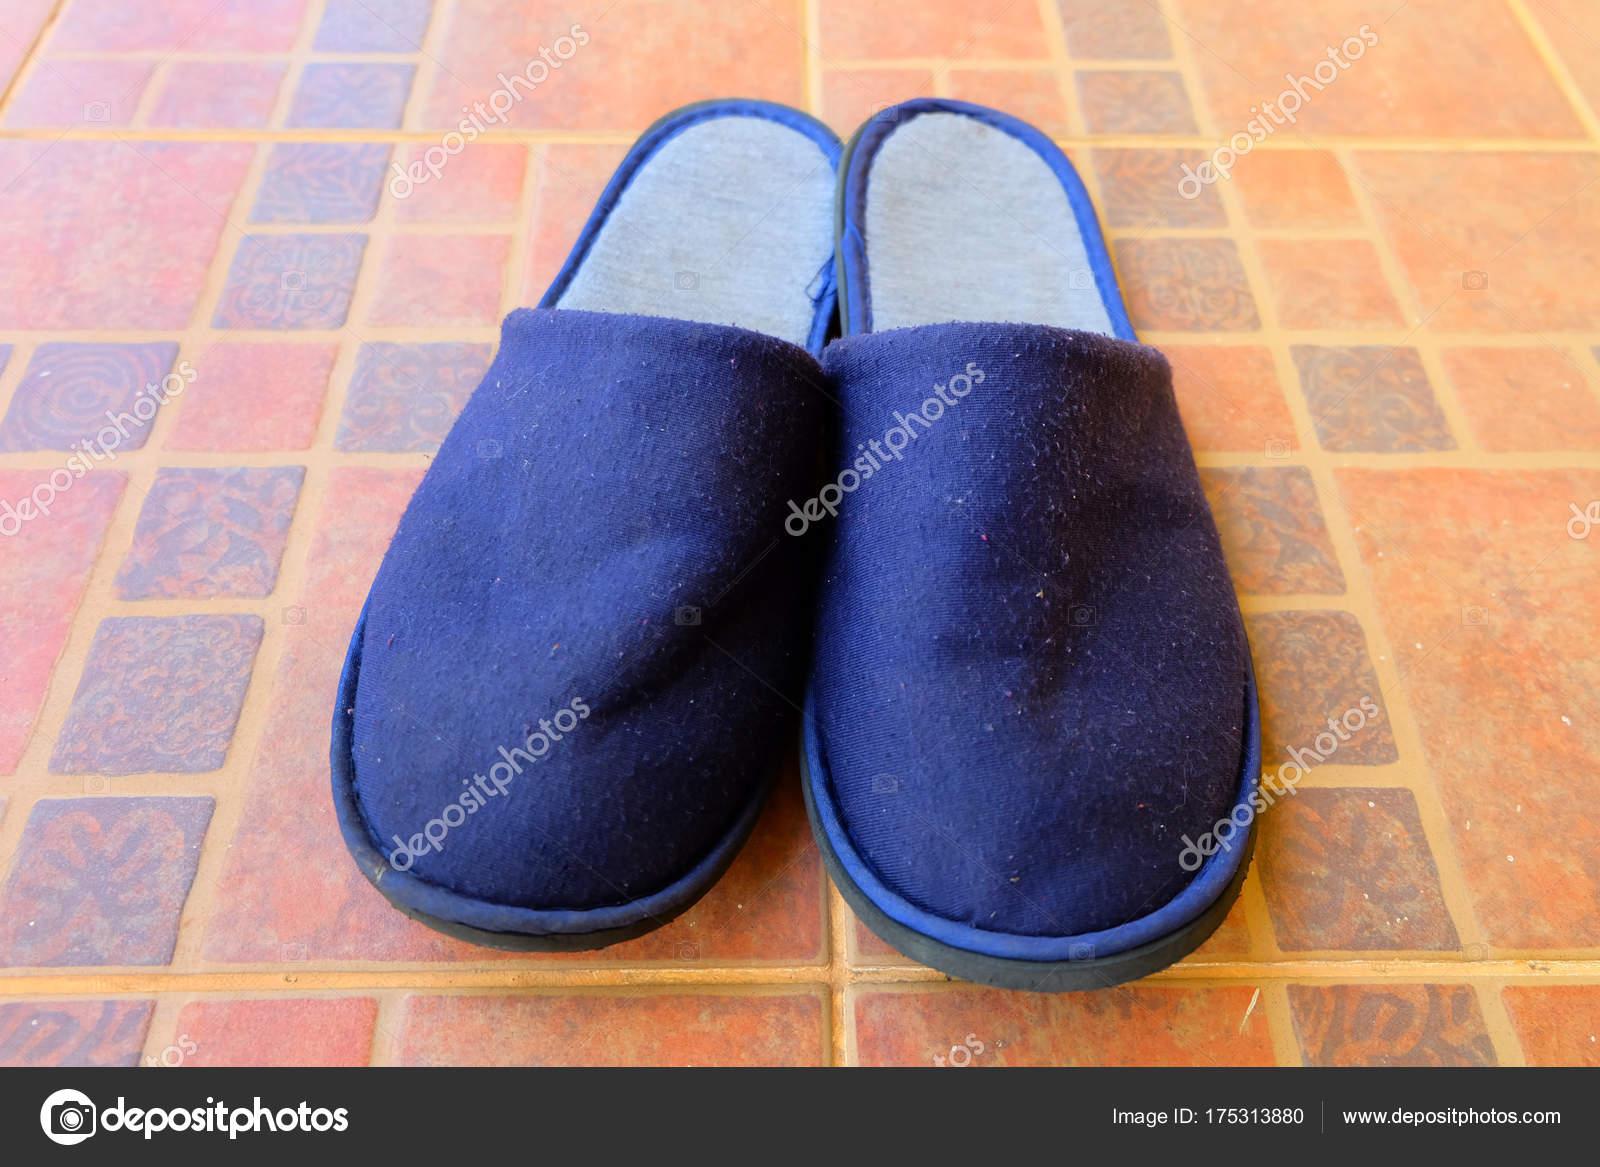 Suaves Azul Aislados Par Zapatos Blanco Cama Zapatillas PuOikTwXZ